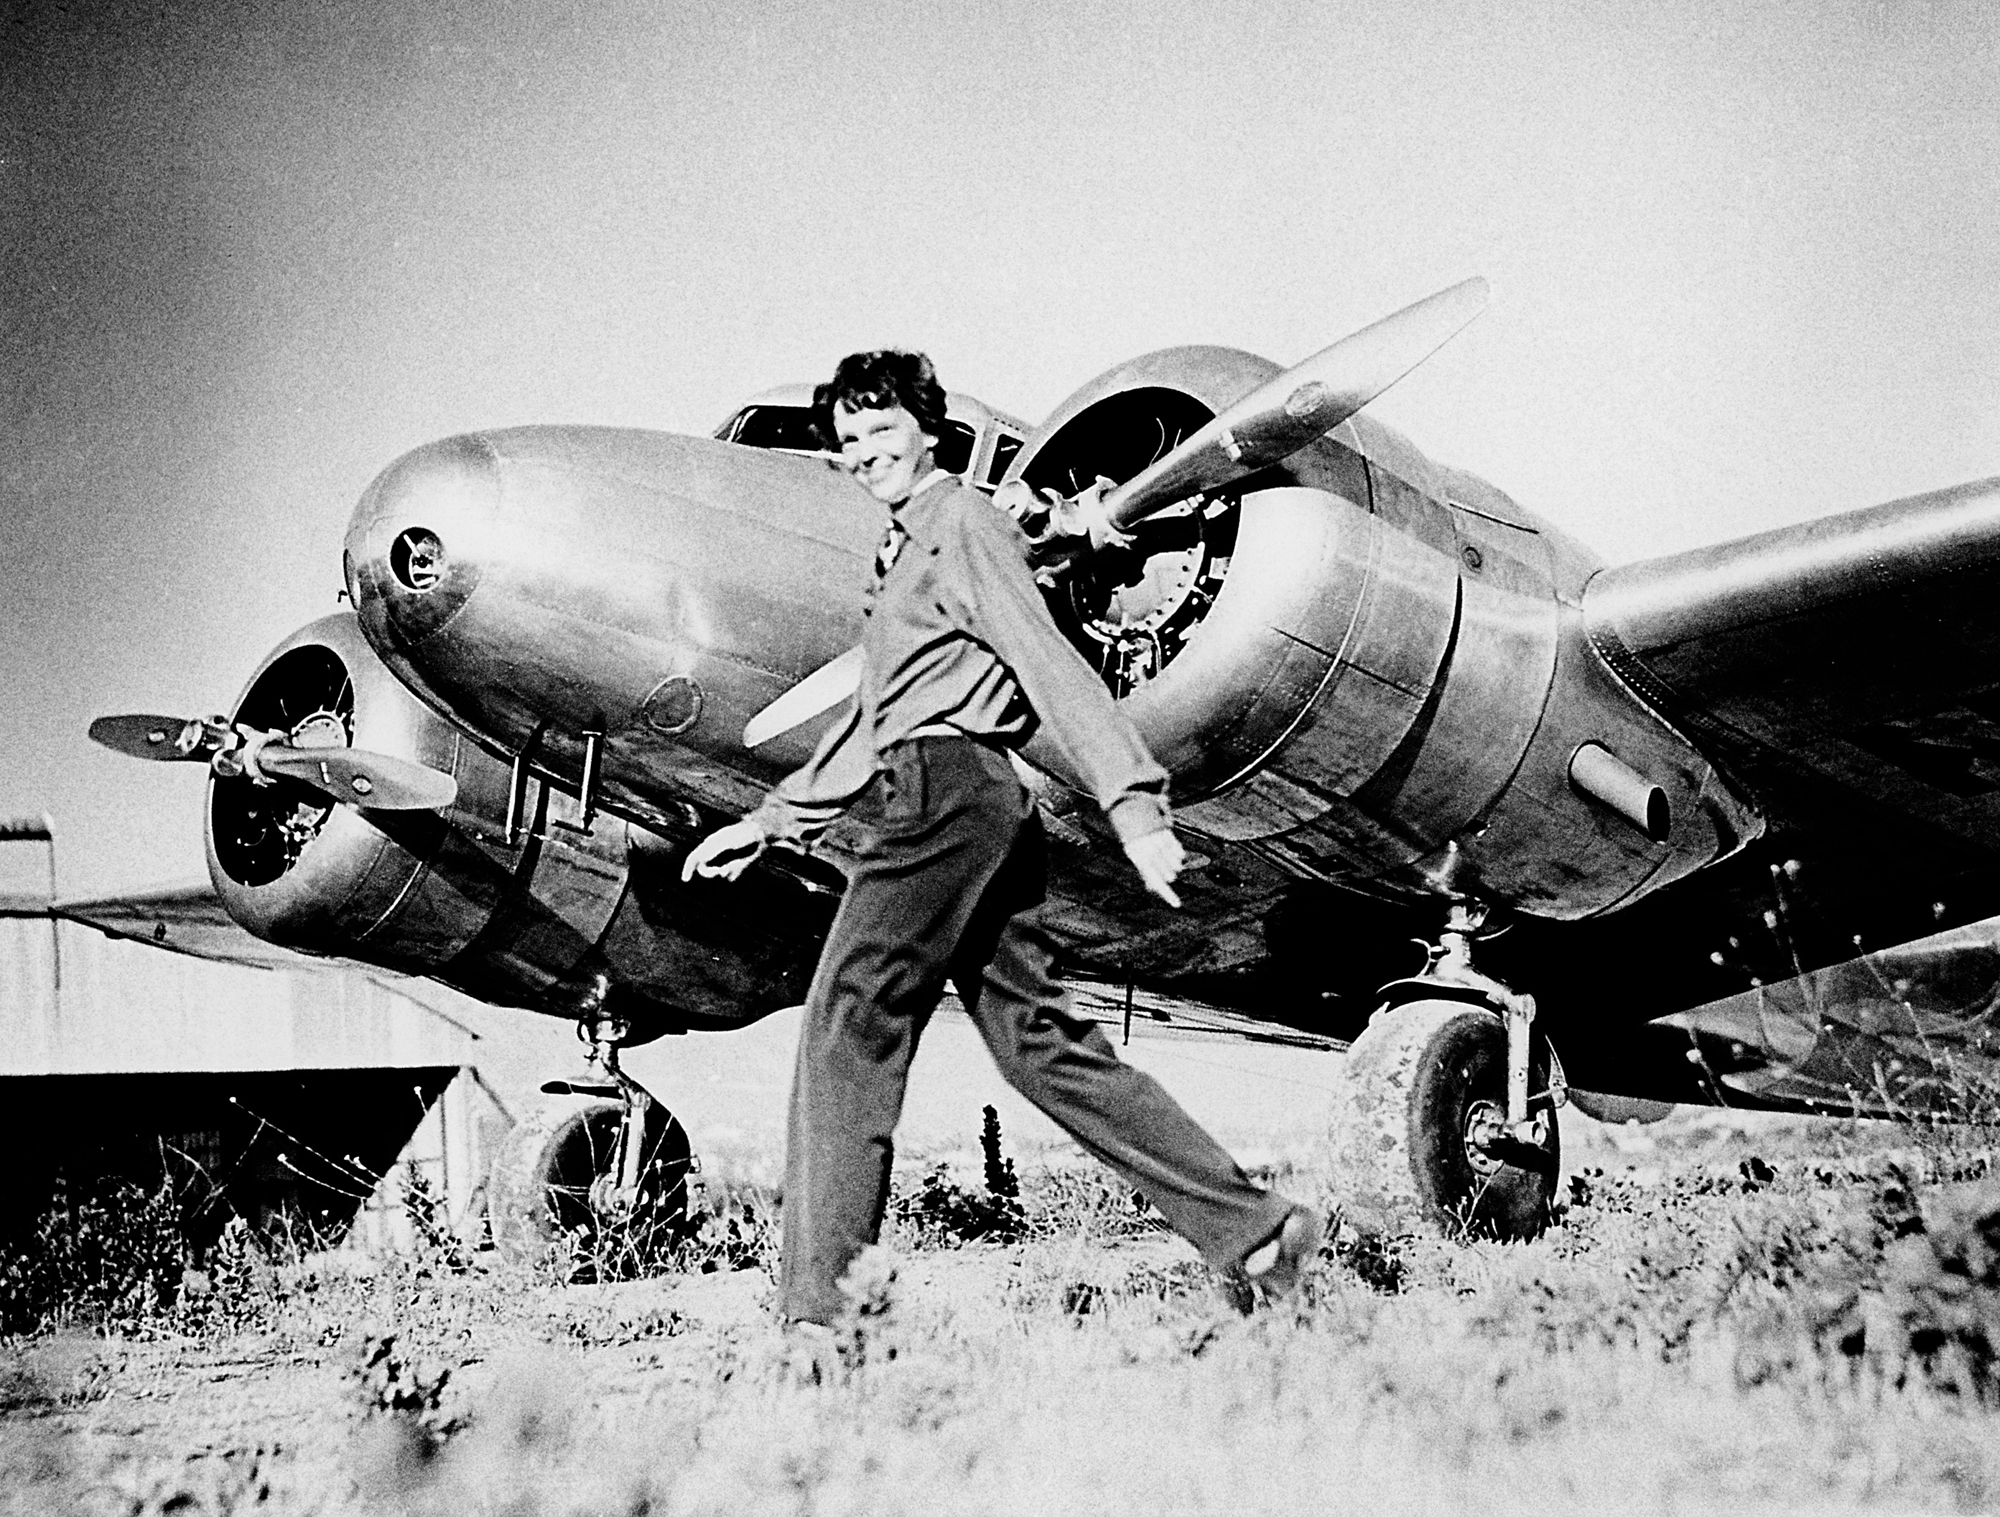 Female aviation legend Amelia Earhart